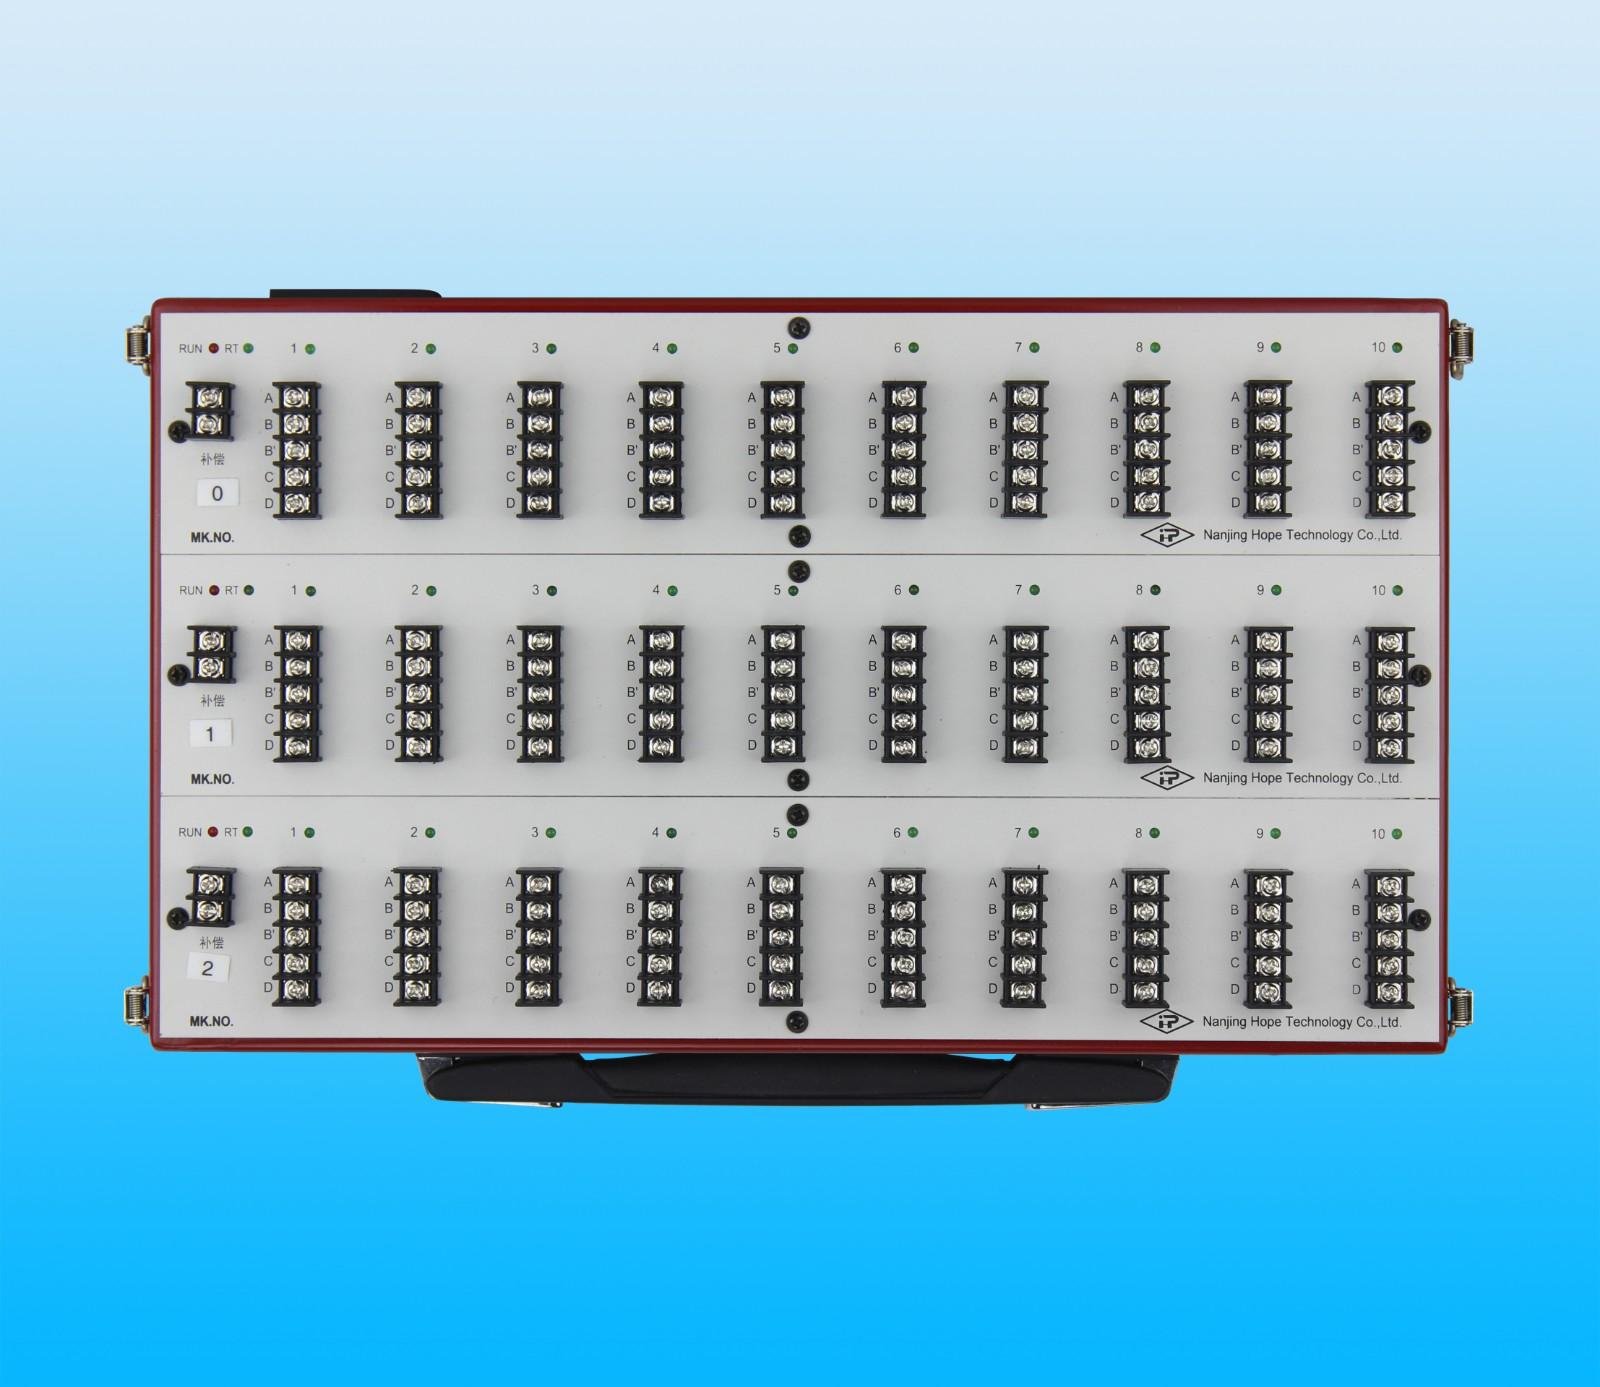 HP-JY1003静态优发国际顶级在线应变测试分析系统